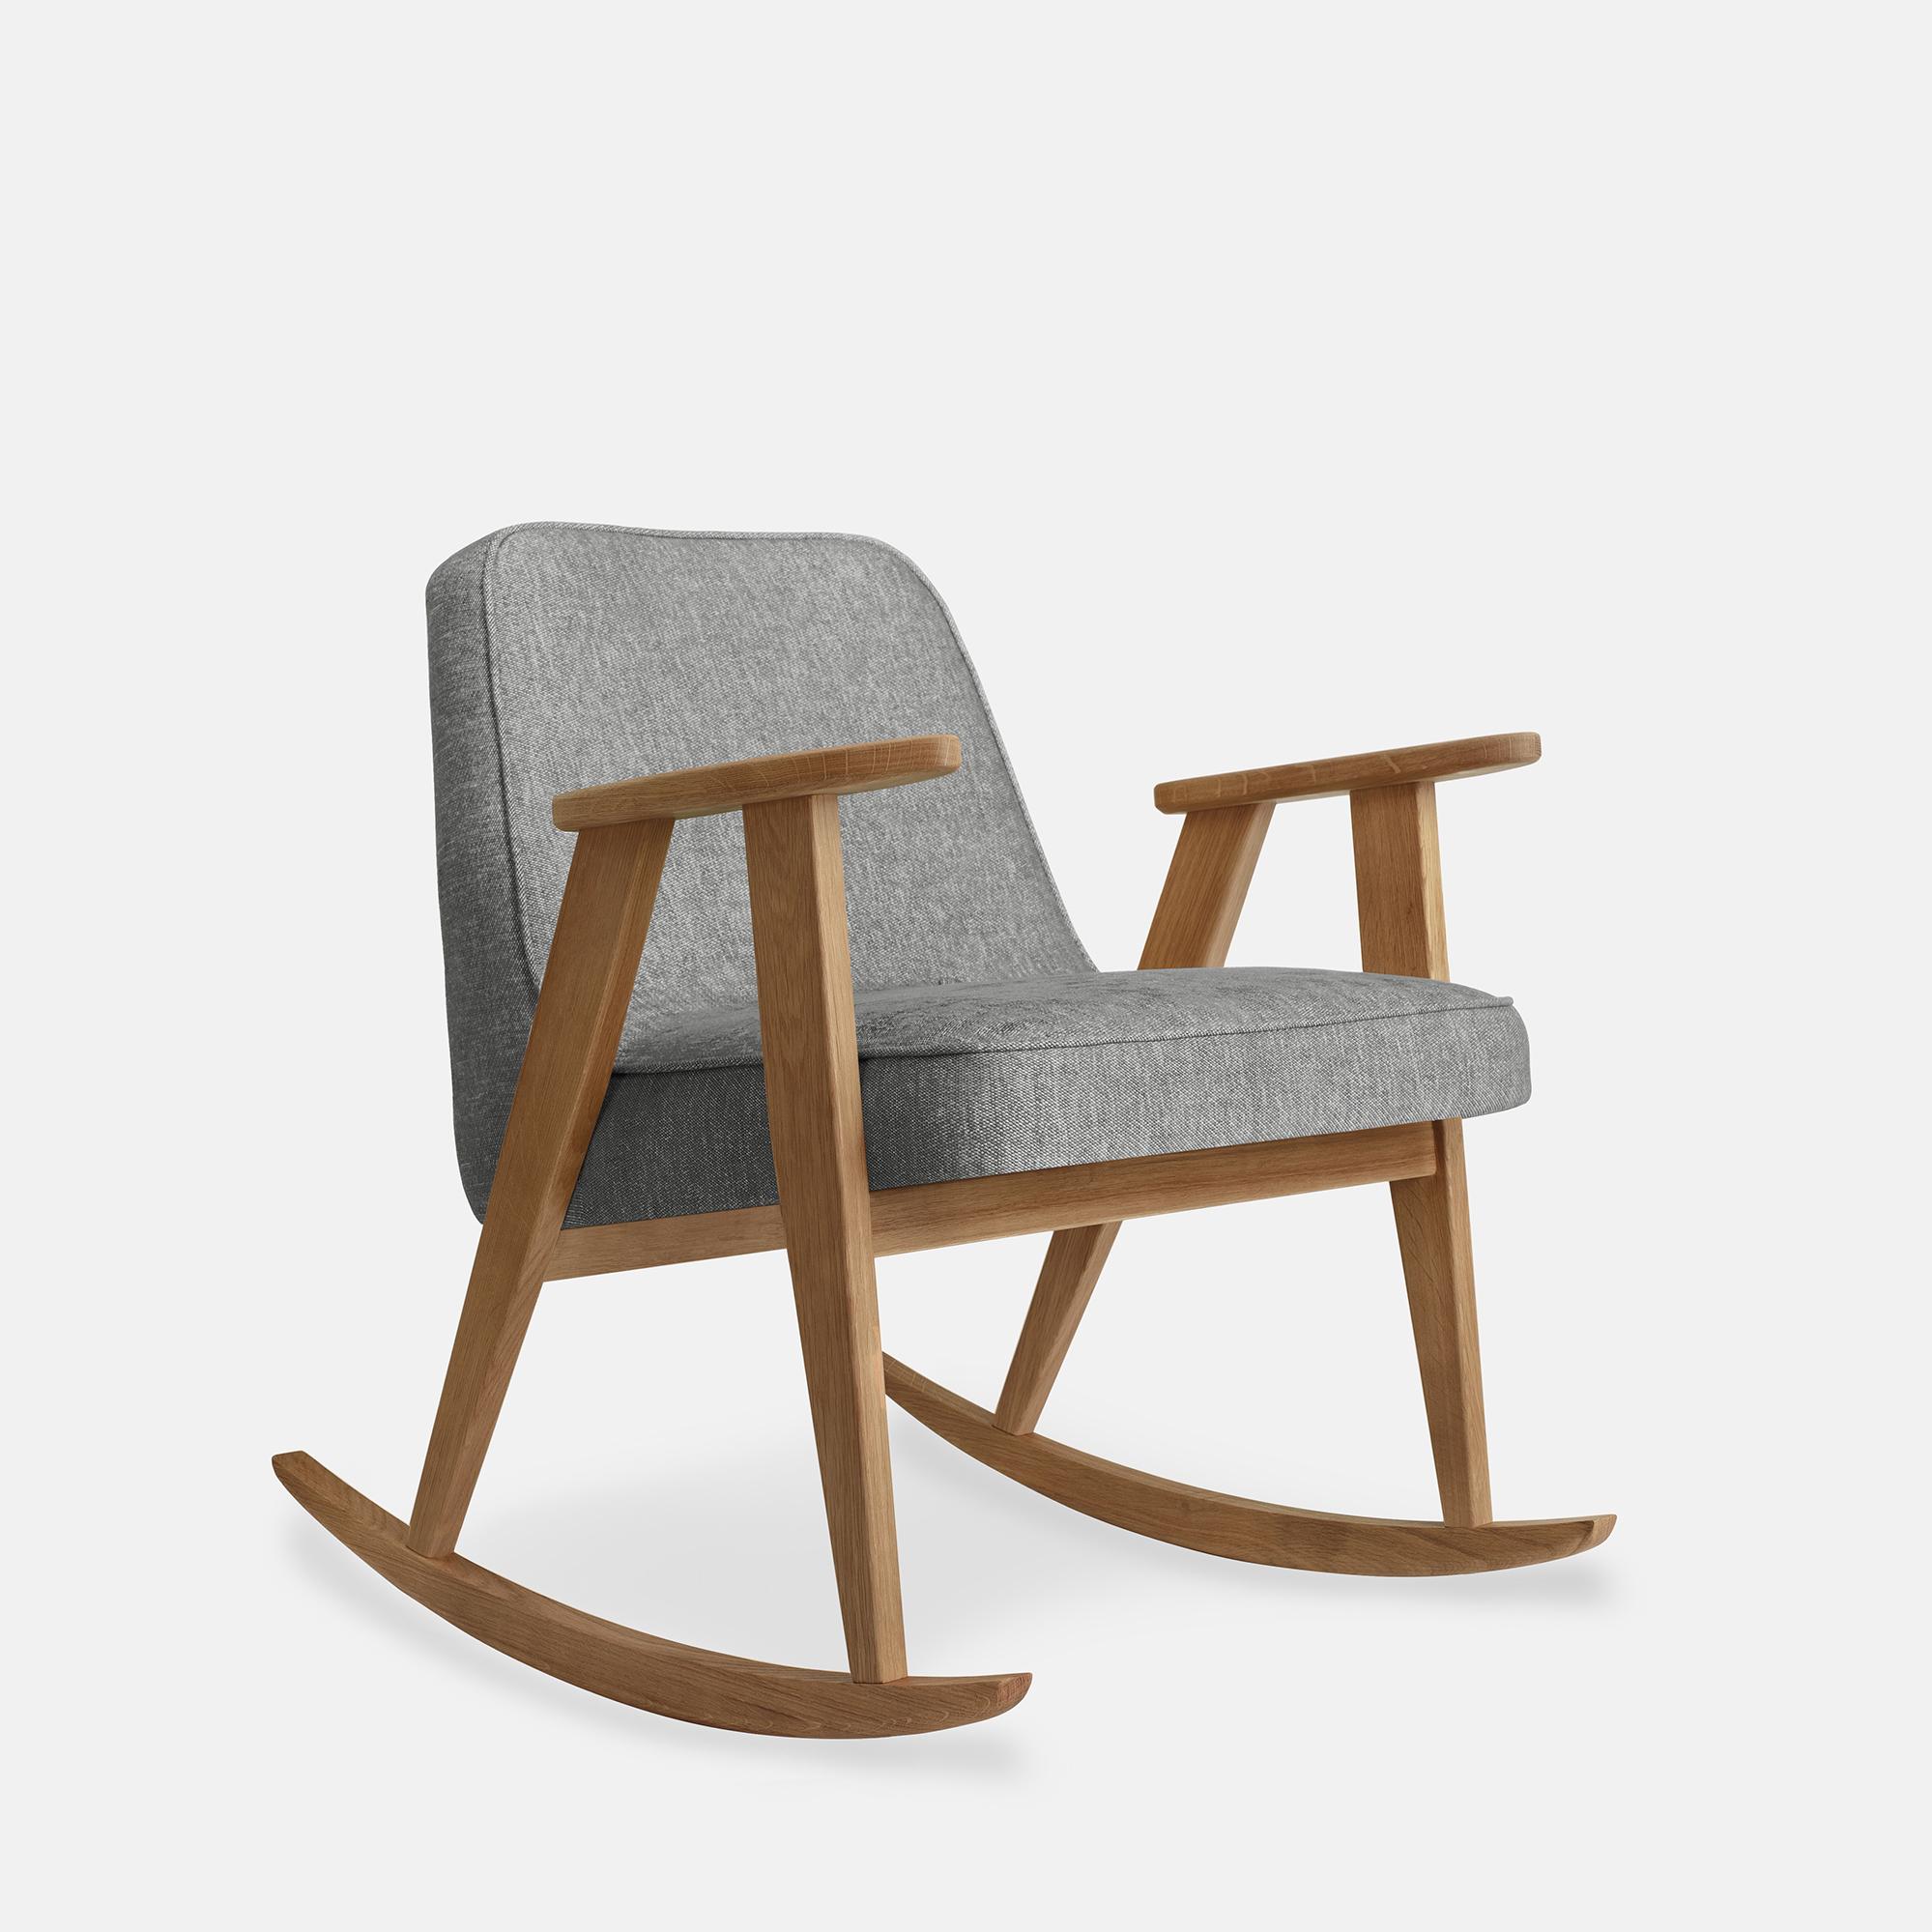 366-Concept-366-Rocking-Chair-W02-Loft-Silver